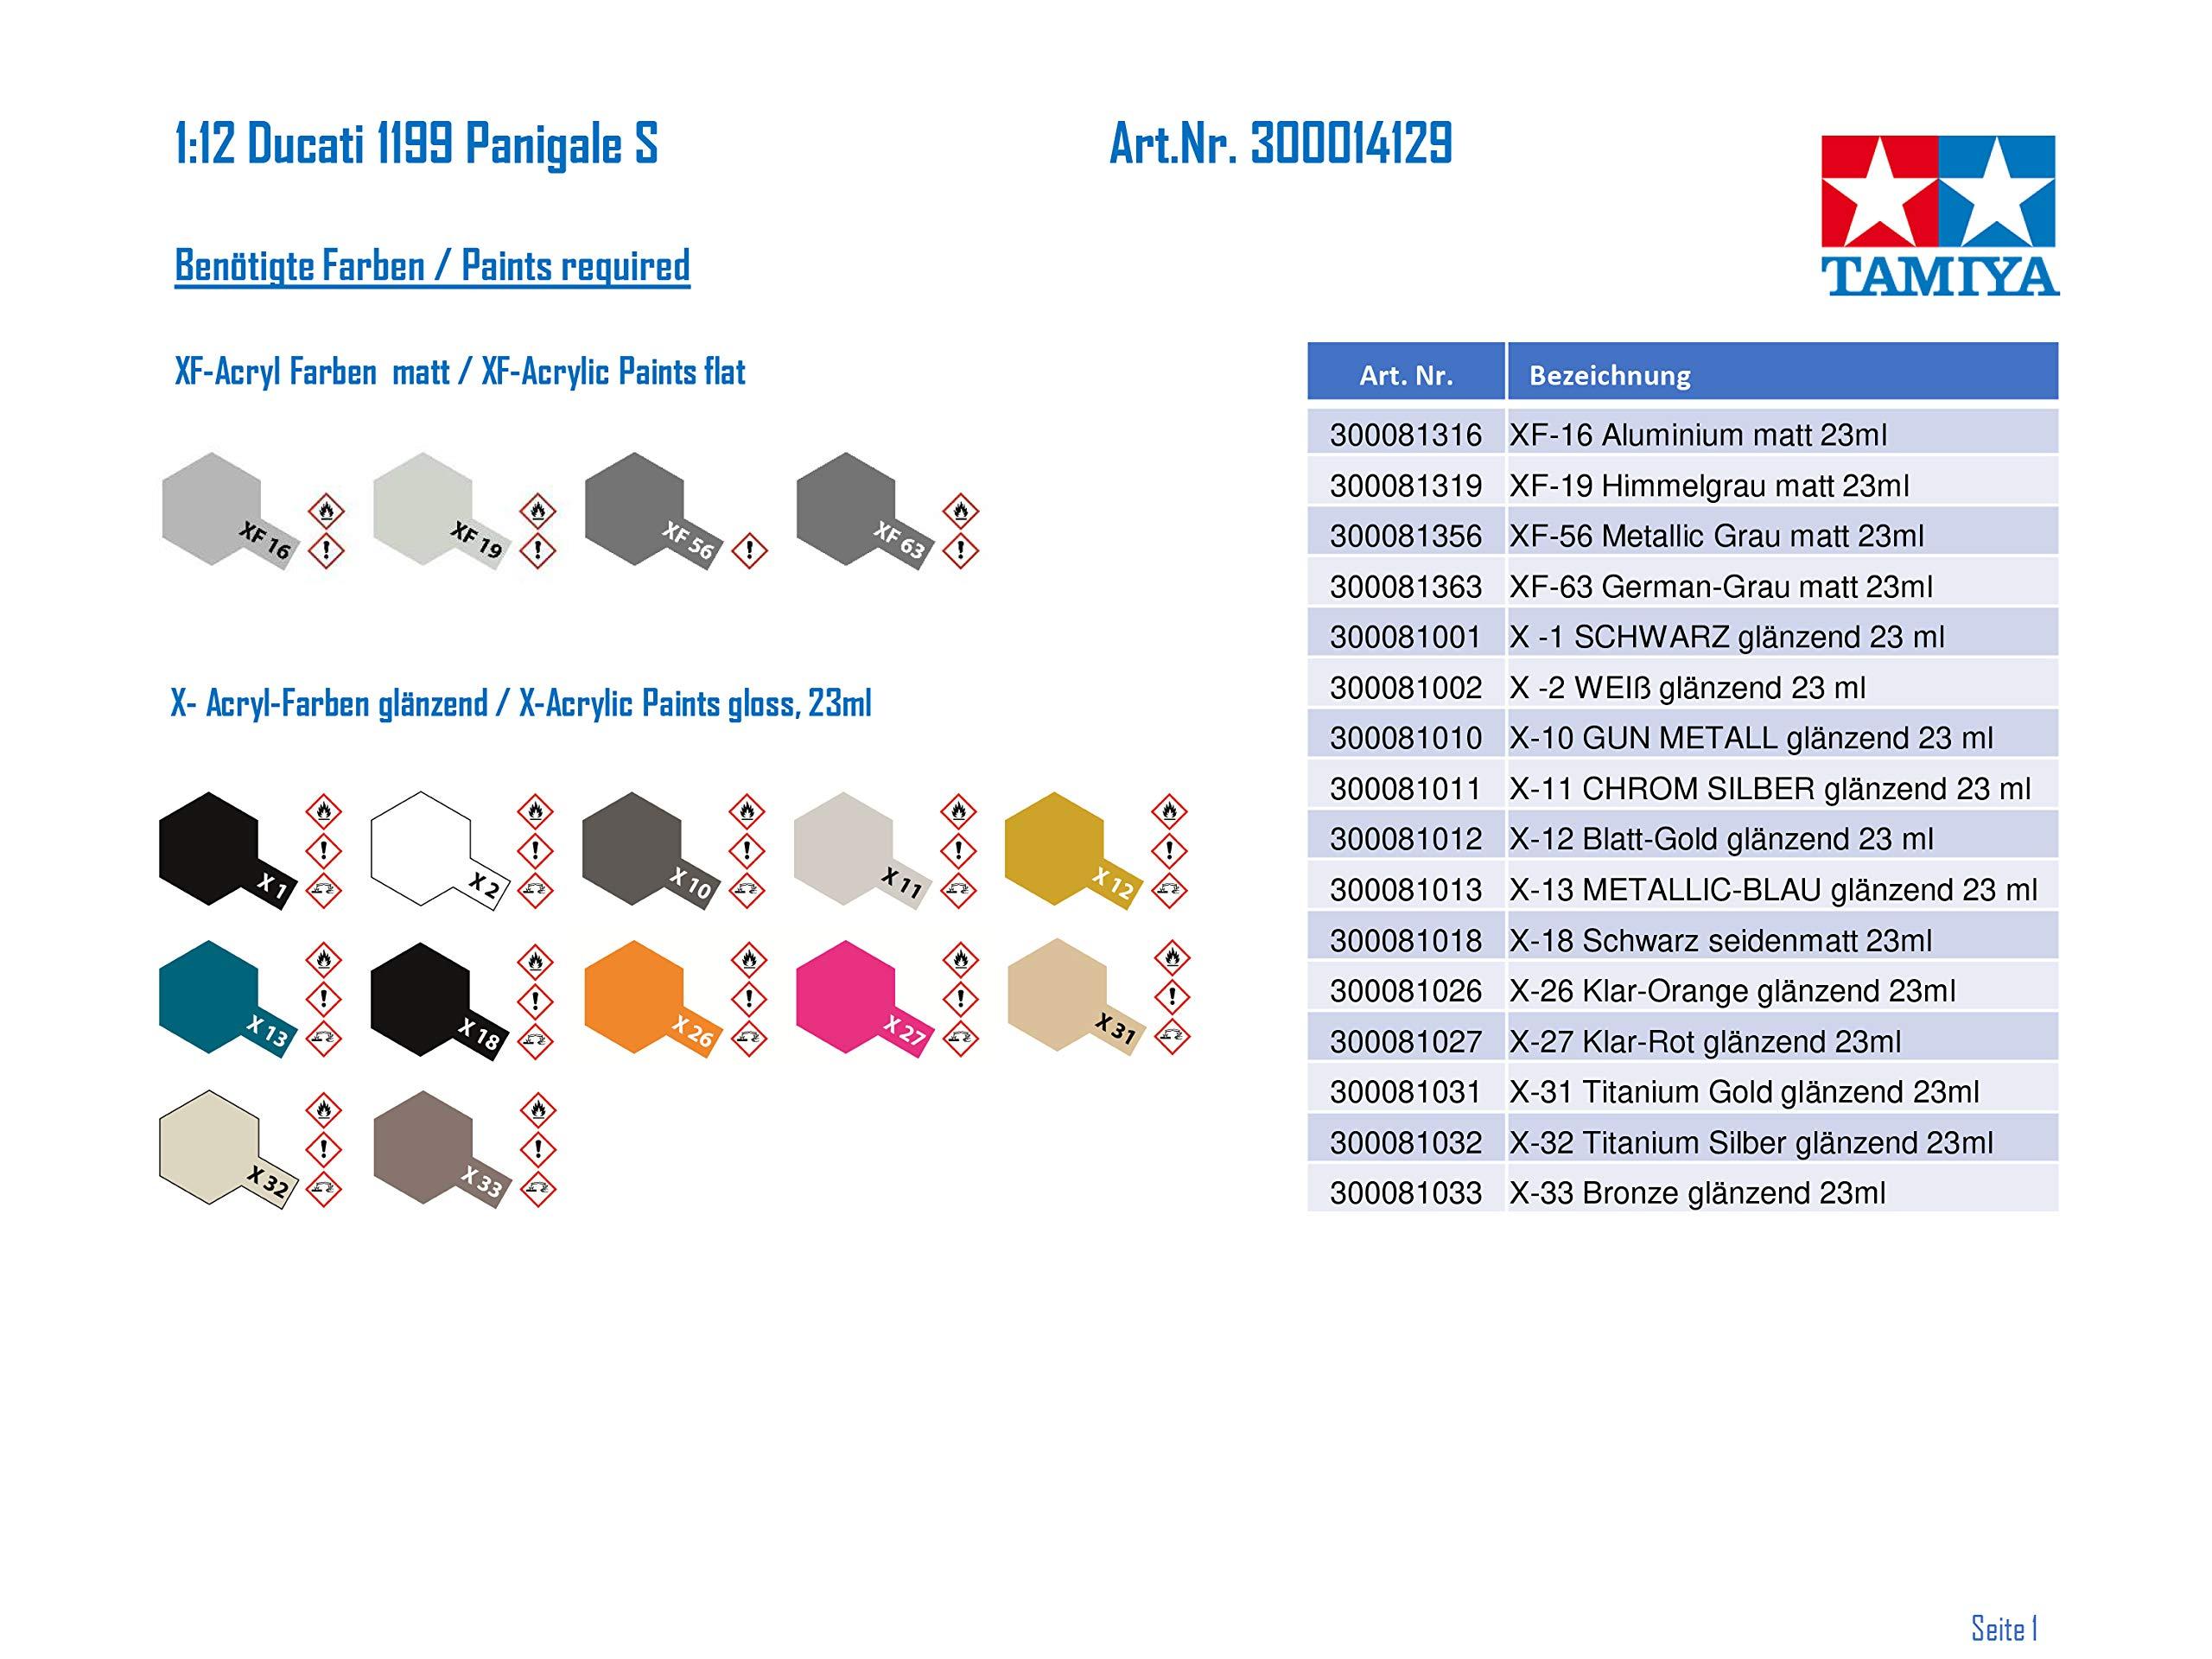 Tamiya 14129 1:12 Ducati 1199 Panigale S Model 3